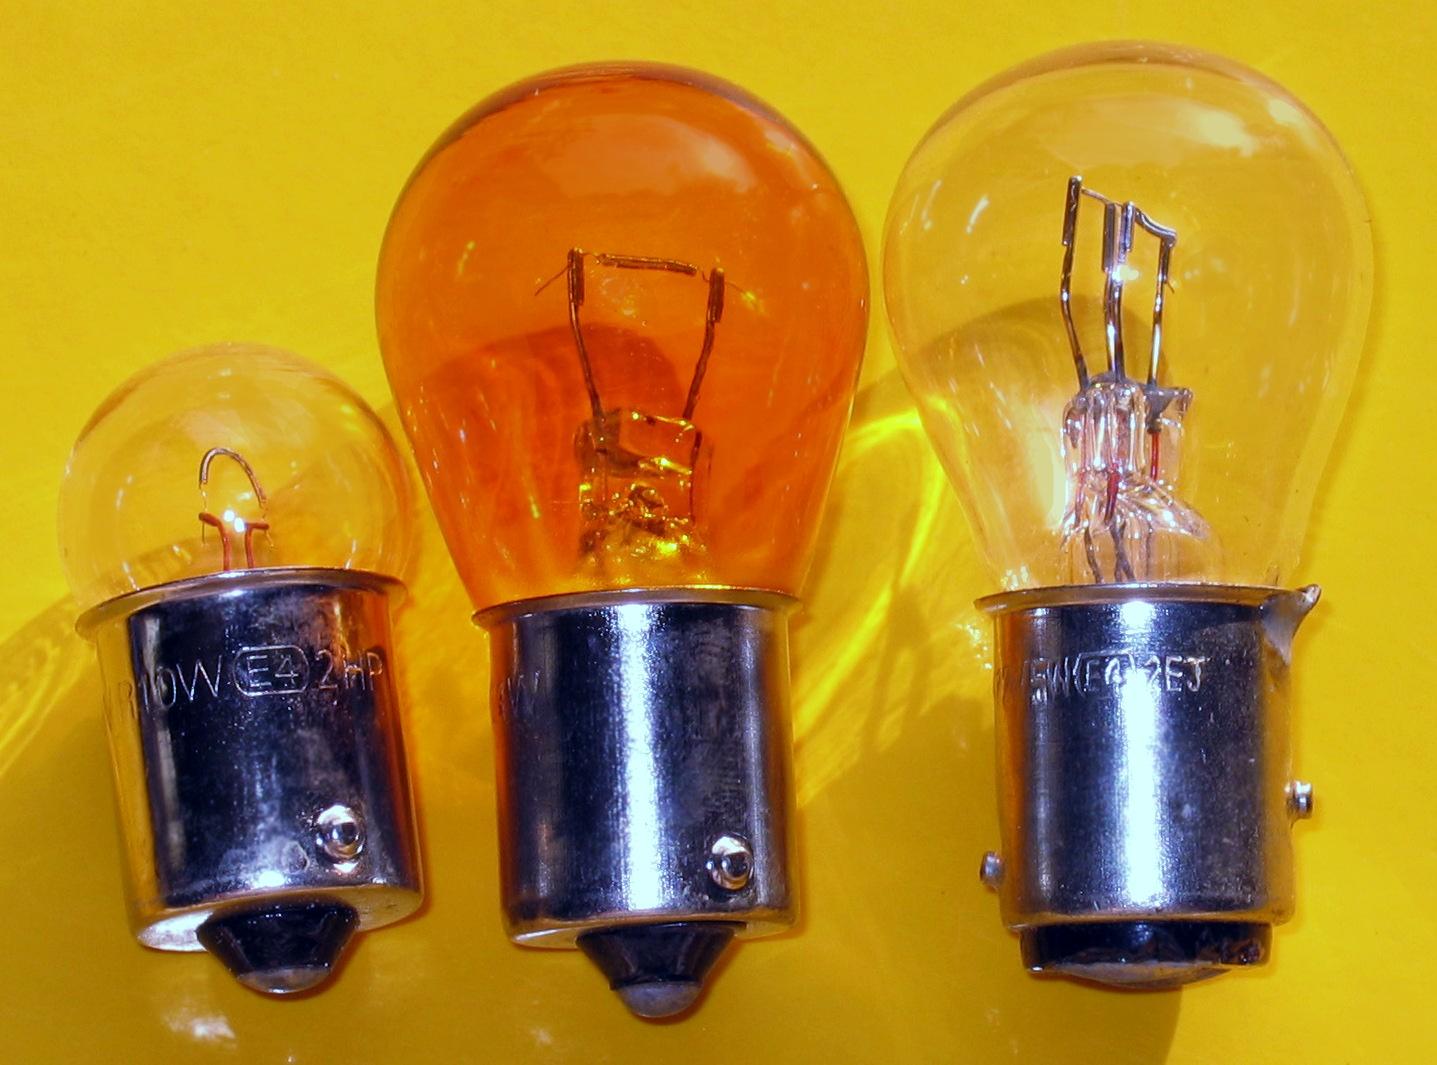 File:AUTOMOTIVE LIGHT BULBS 1157 21 5 W IMG 1310.JPG